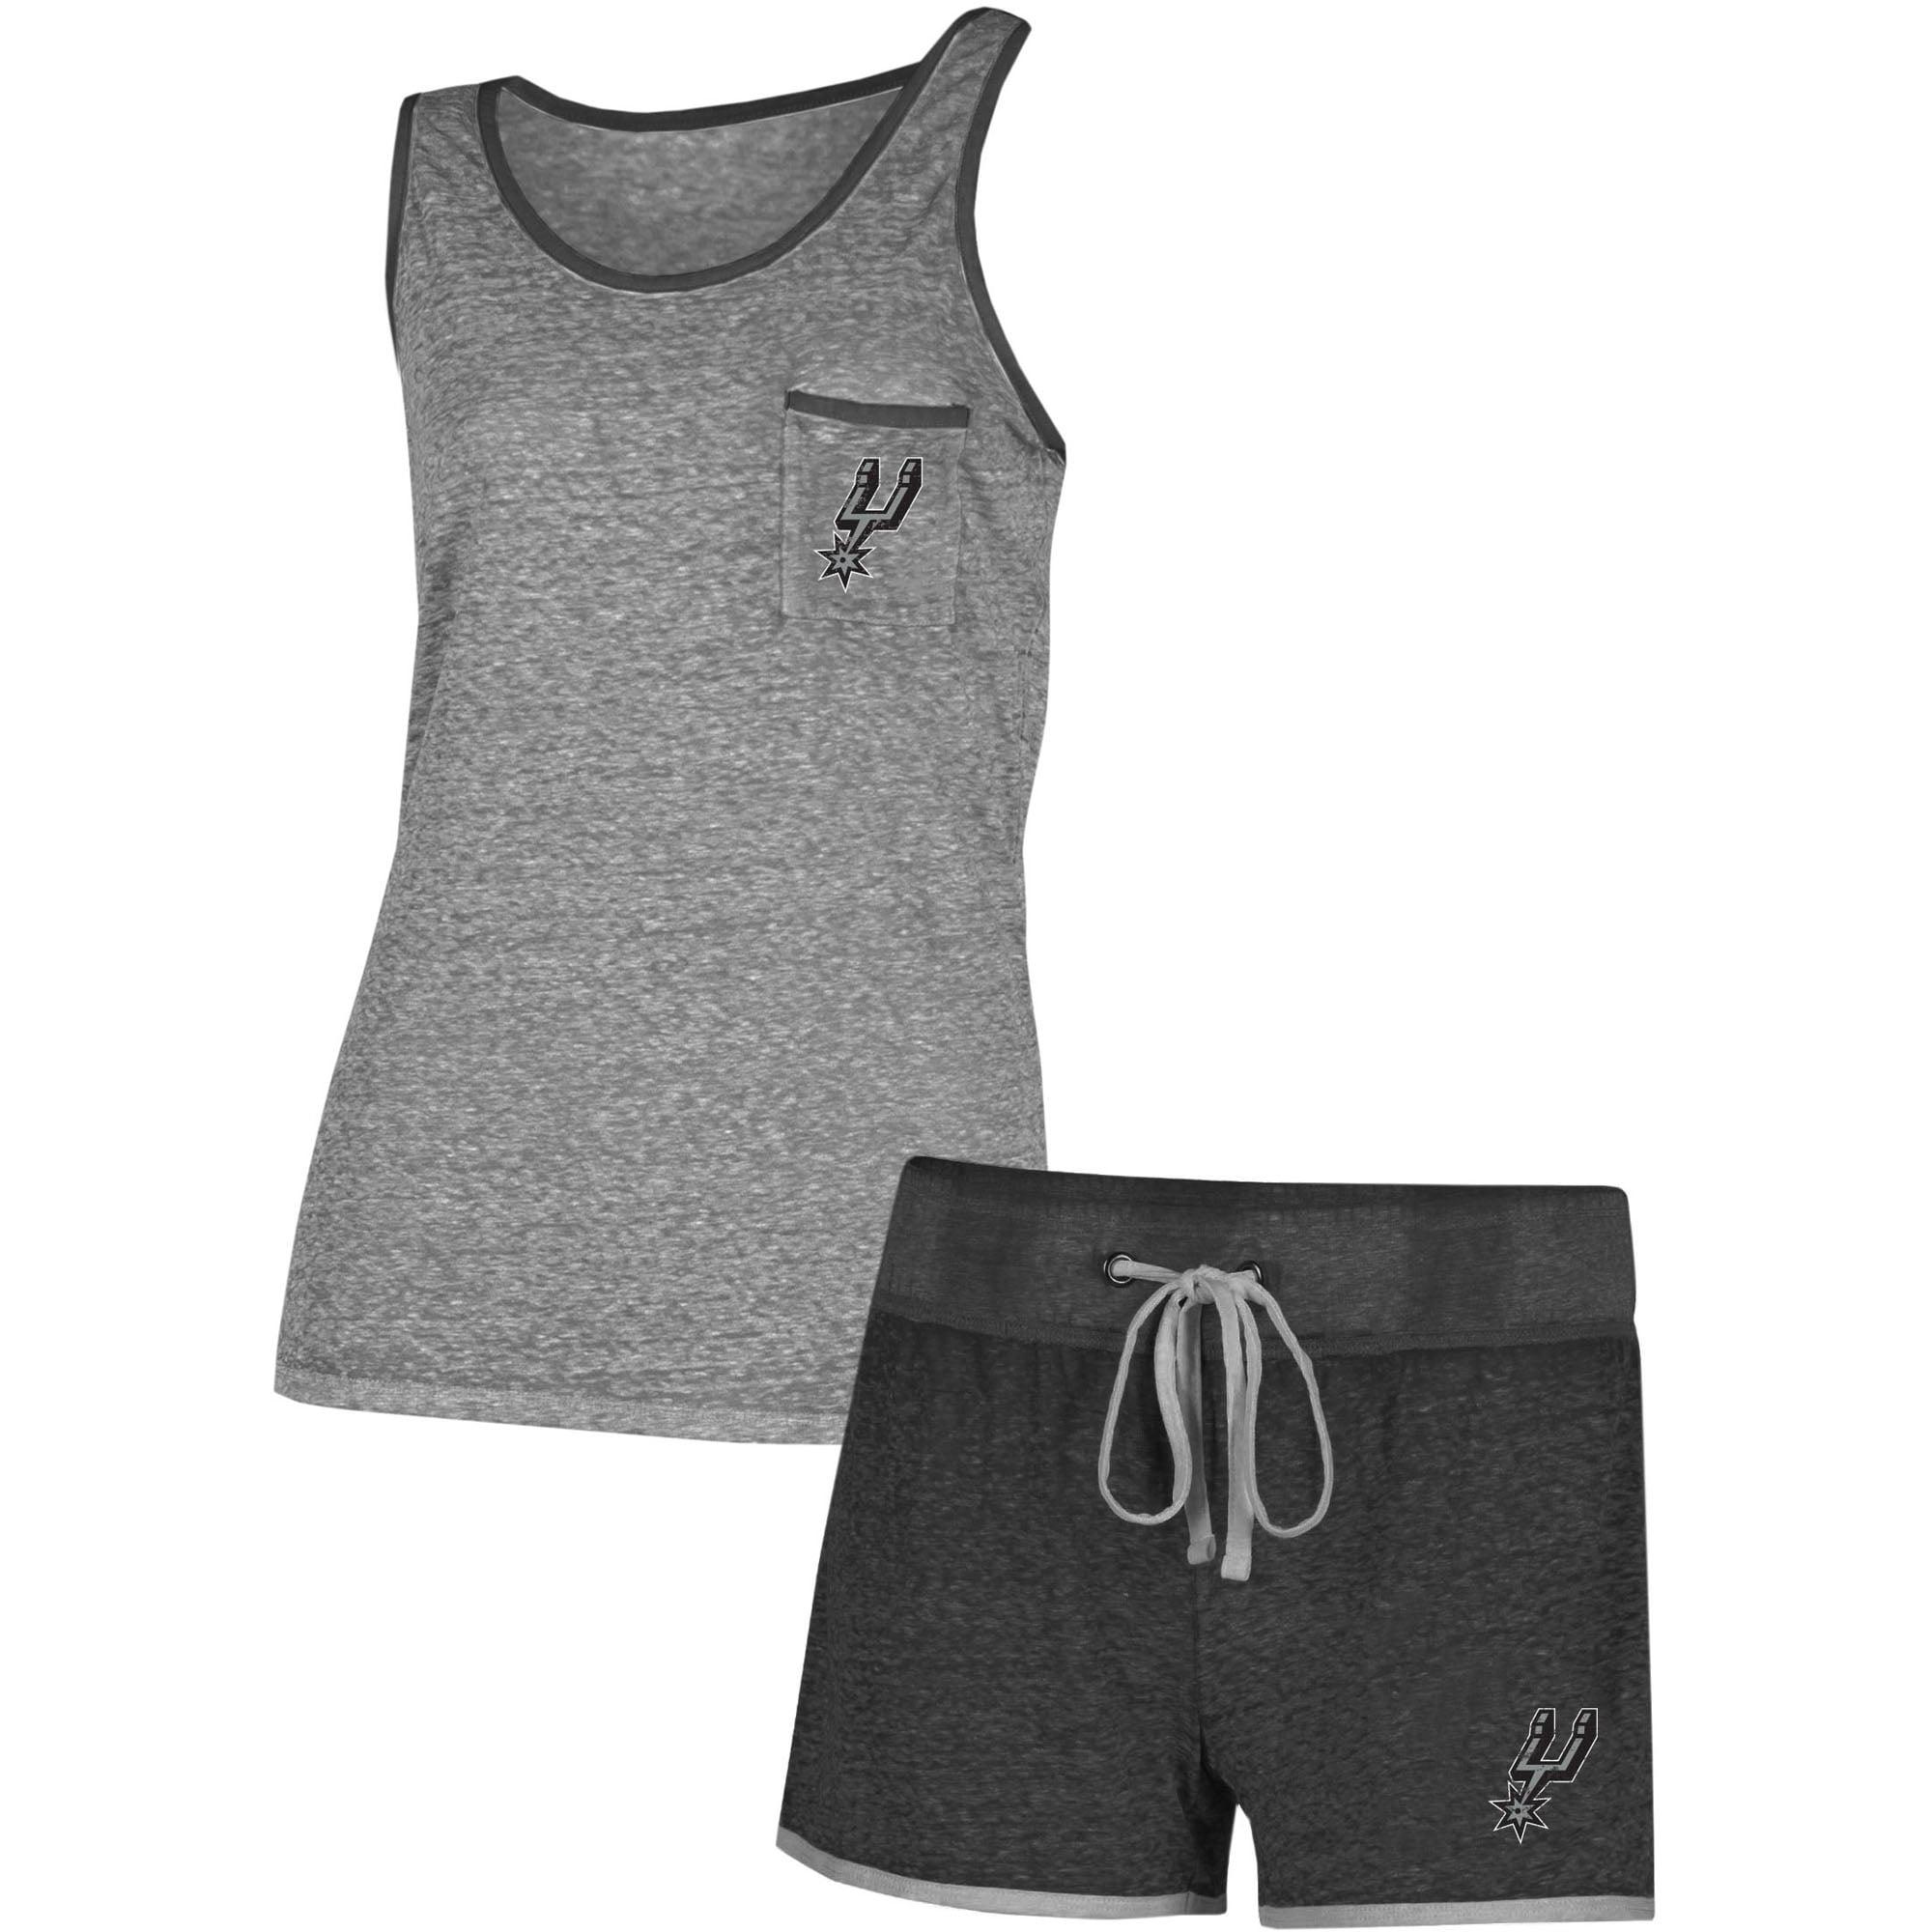 San Antonio Spurs Concepts Sport Women's Squad Tank Top and Shorts Set - Charcoal/Gray